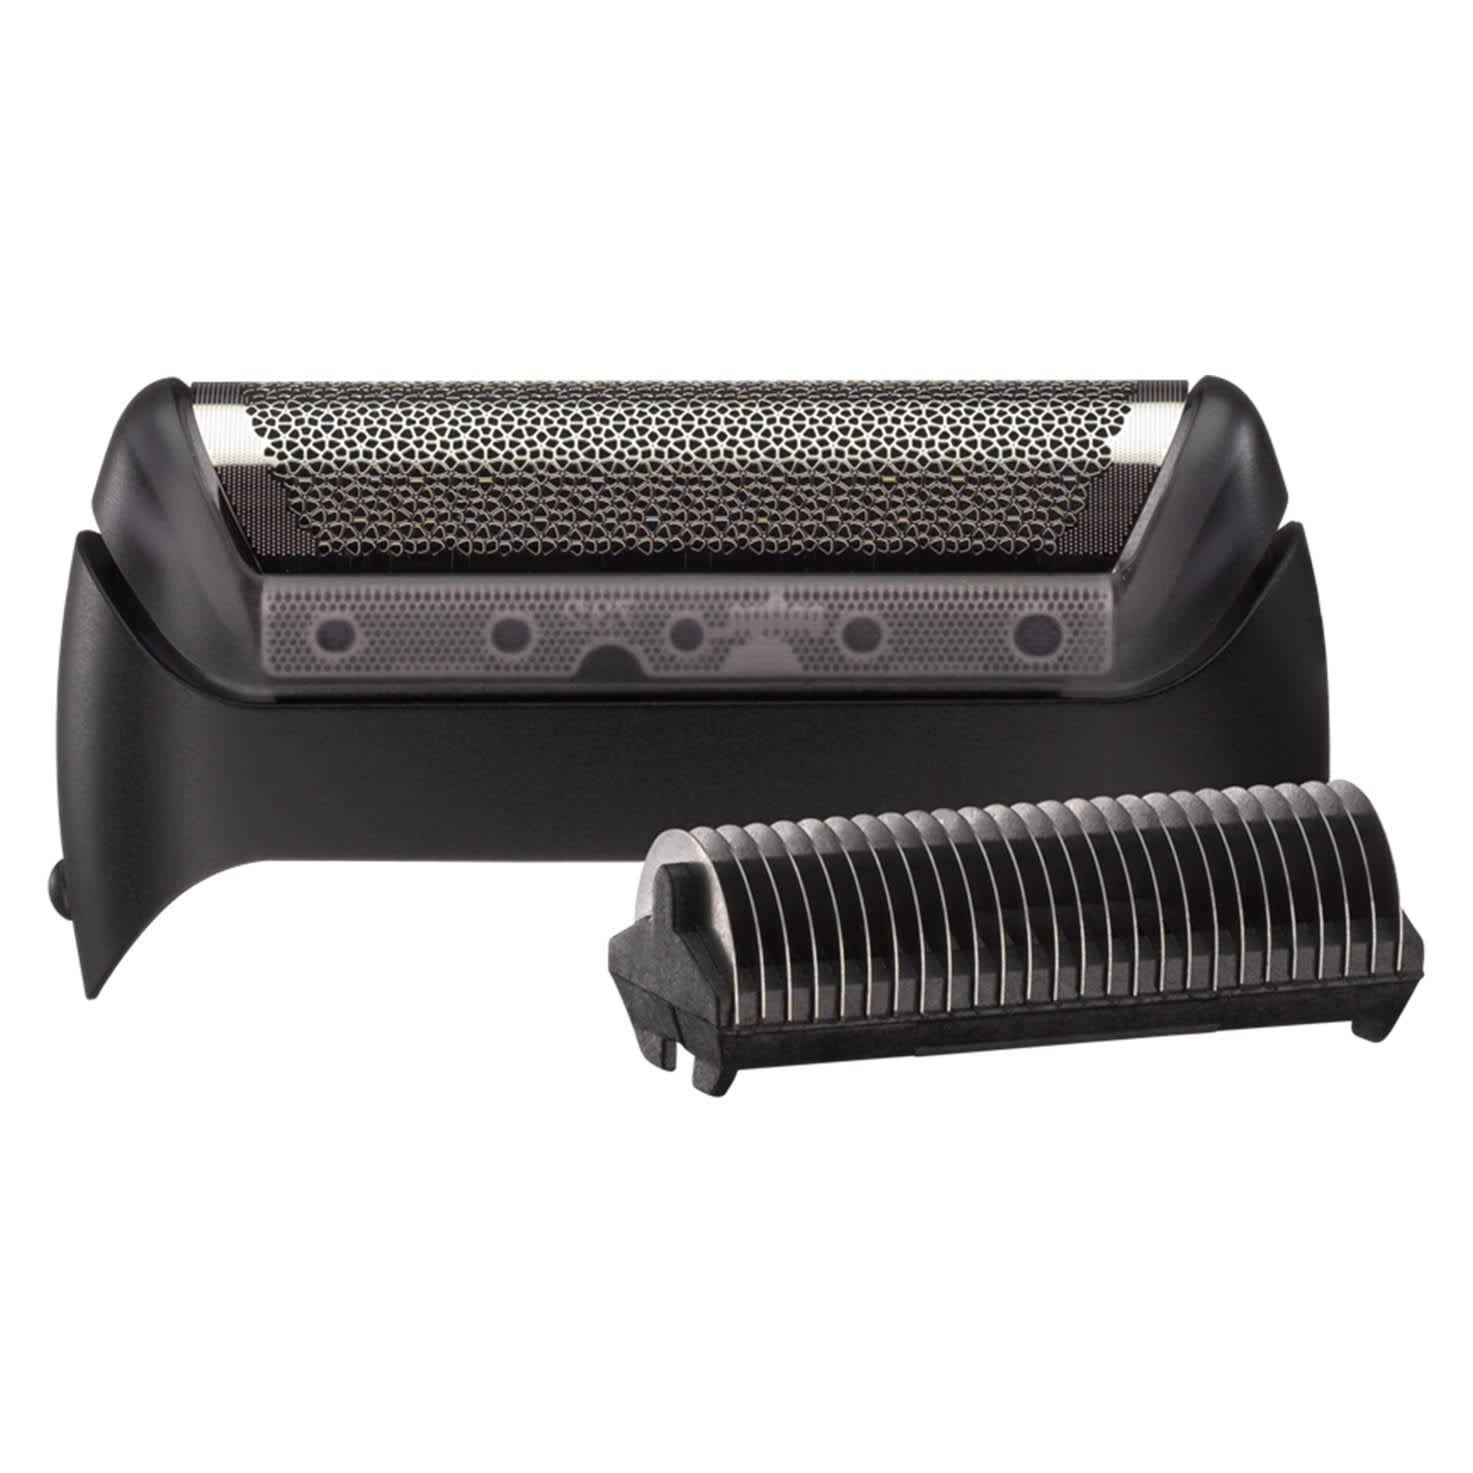 Braun Series 1 Replacement Shaver Head Cassette, 10B, Black